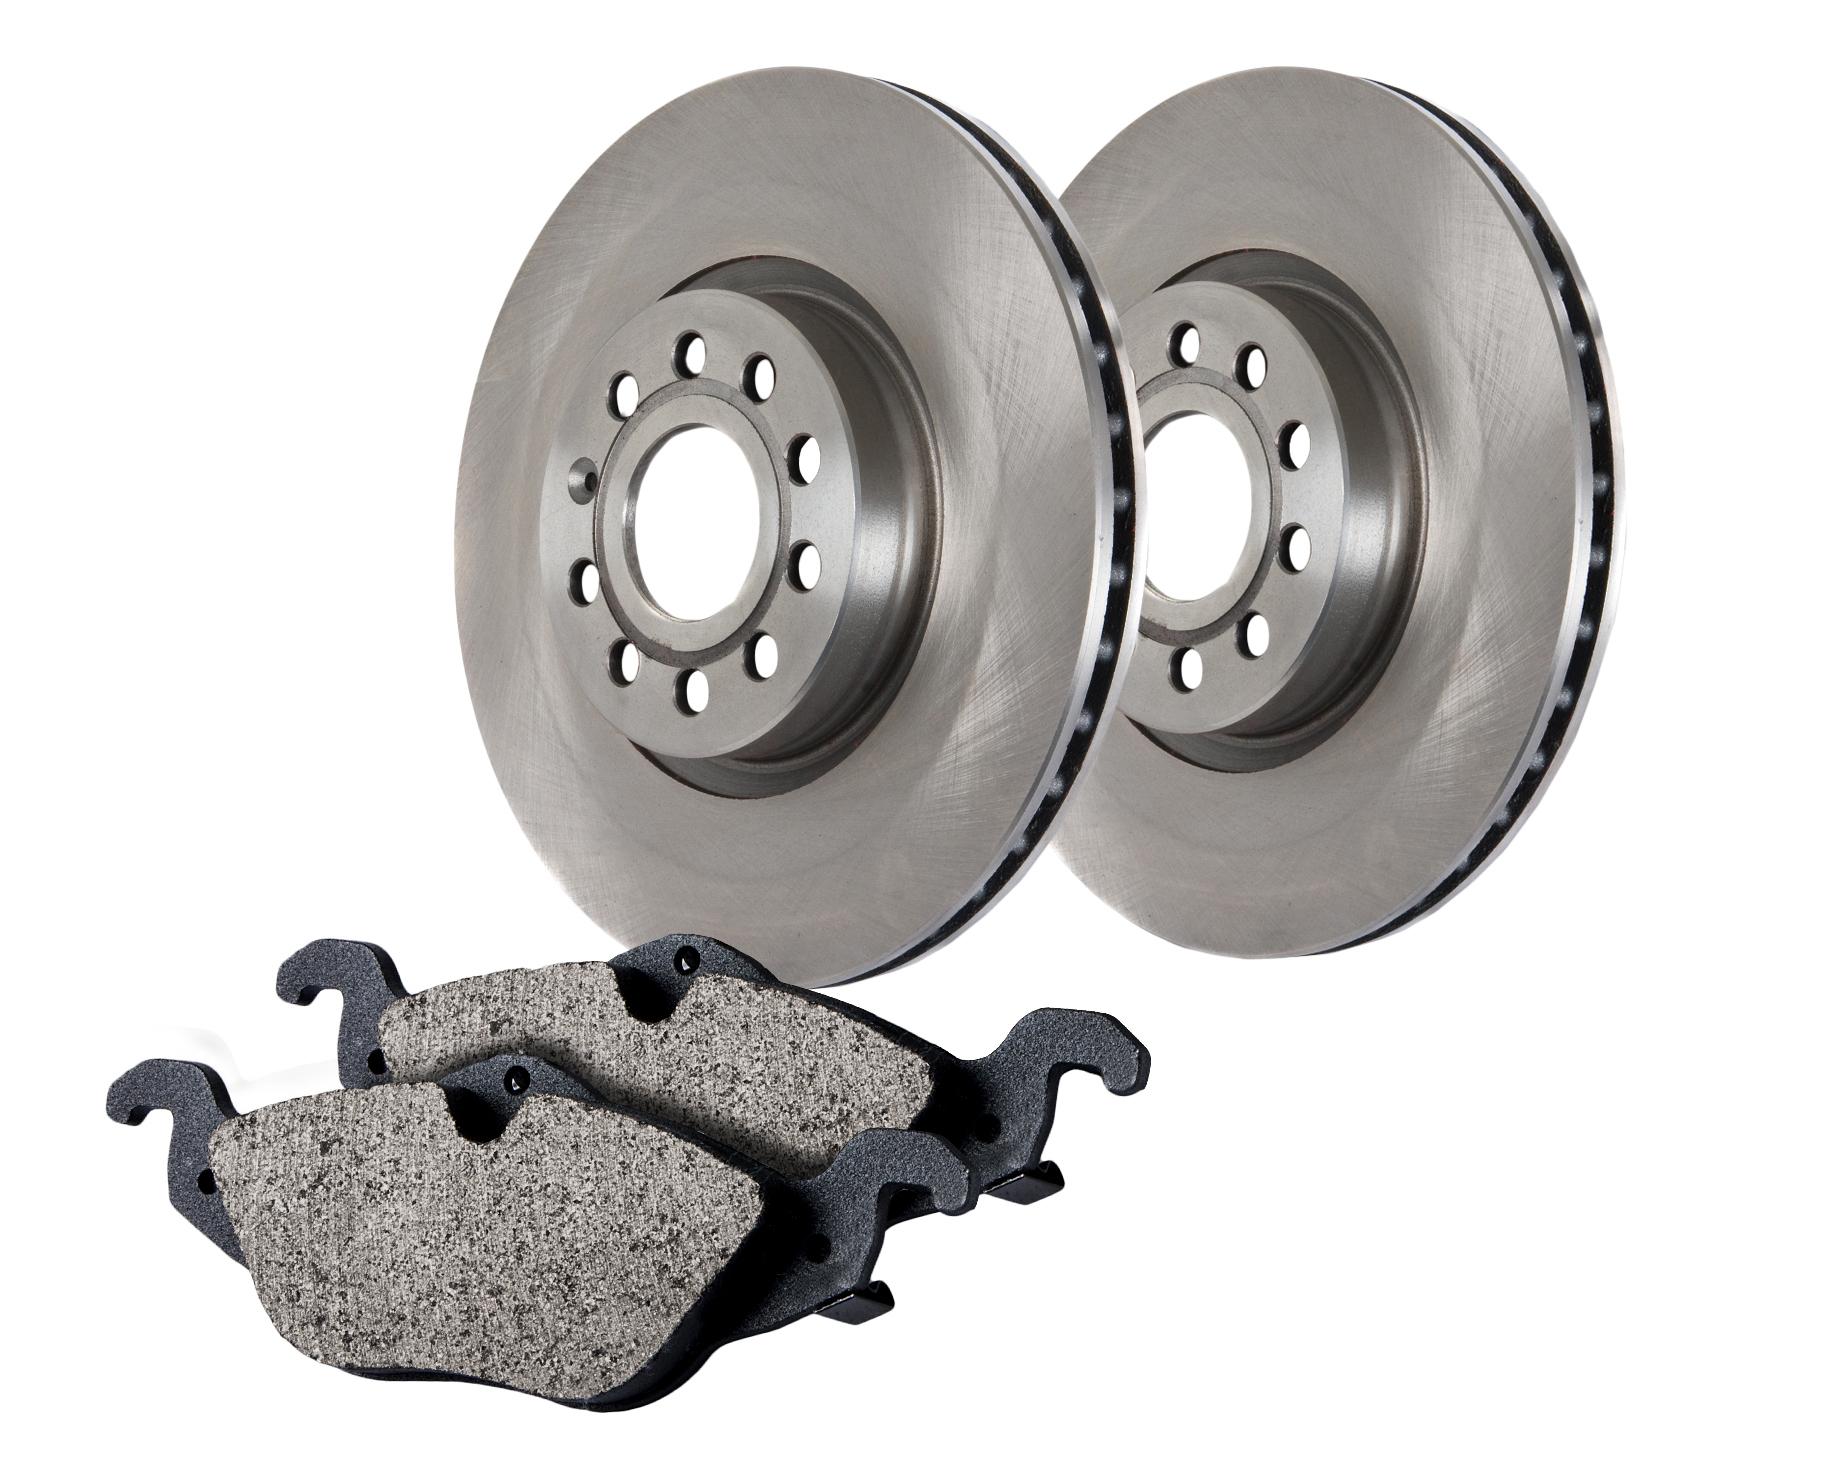 Centric Brake Parts 905.61056 Brake Rotor and Pad Kit, Premium, Semi-Metallic Pads, Iron, Natural, Ford Fullsize Car 1996-97, Kit